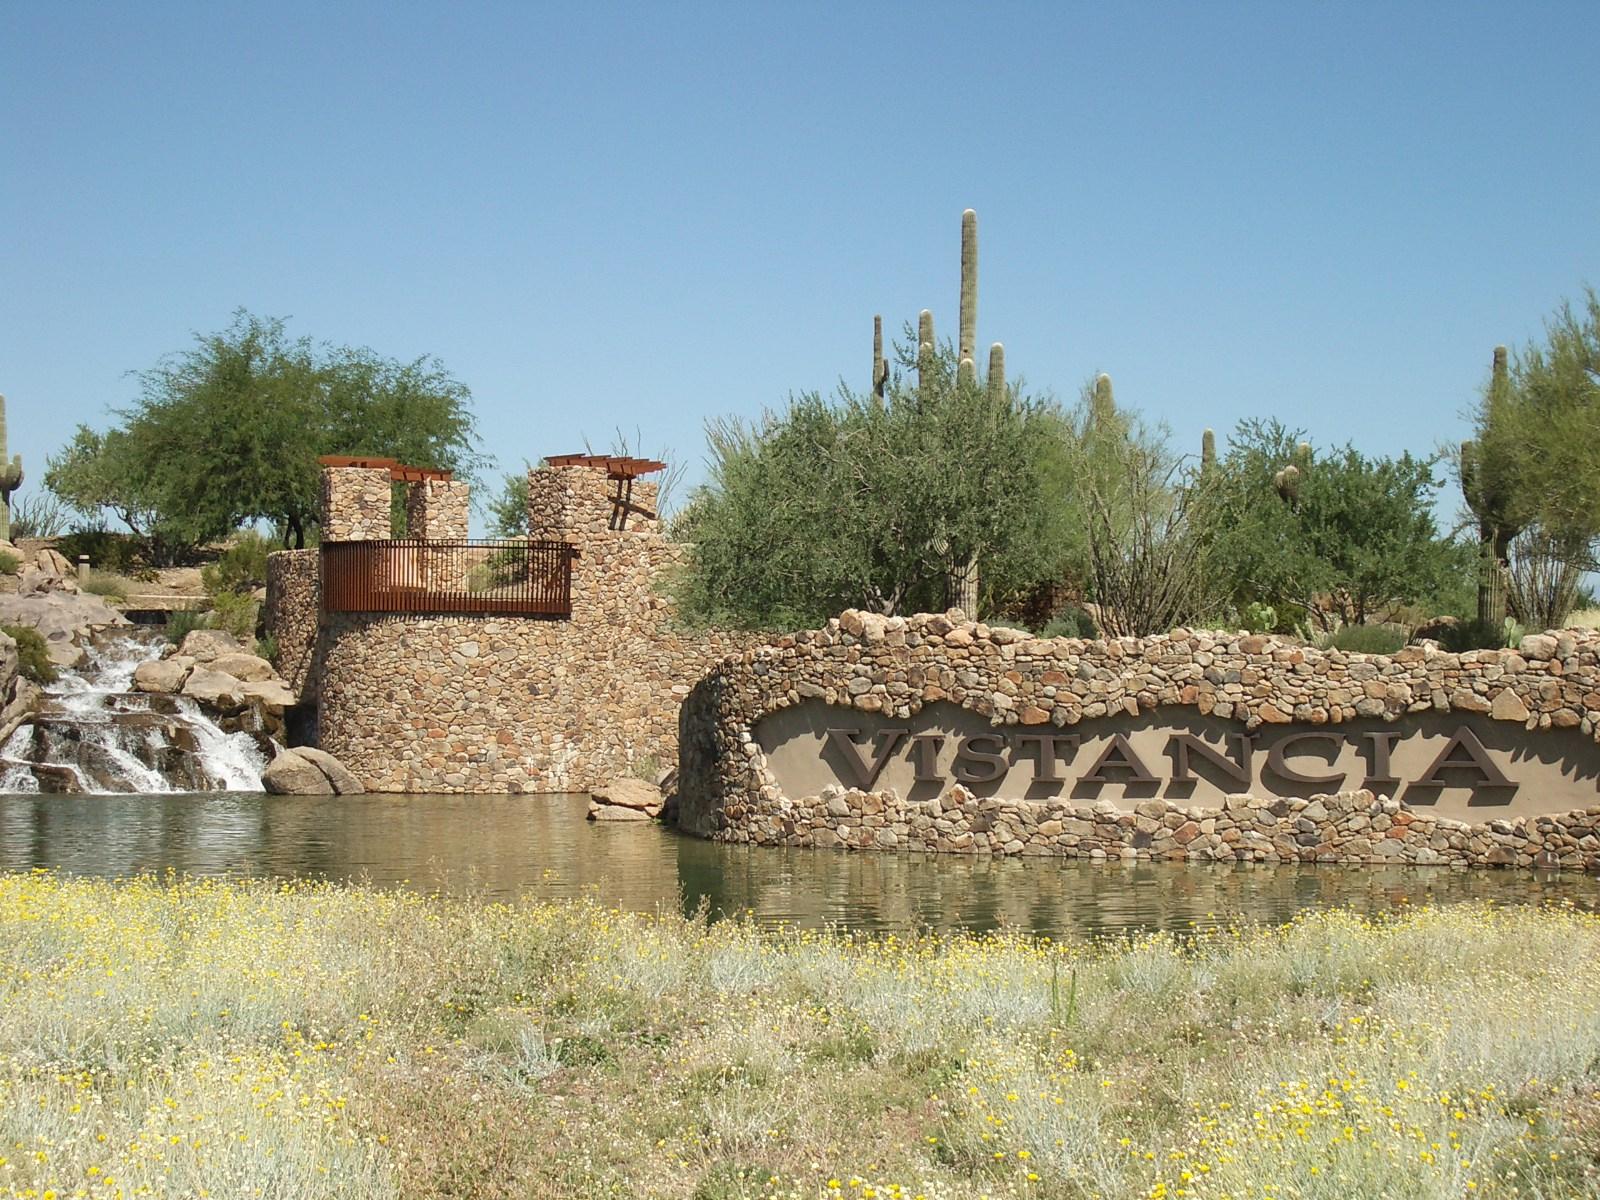 Vistancia W, WWTP, Rec. Water MP